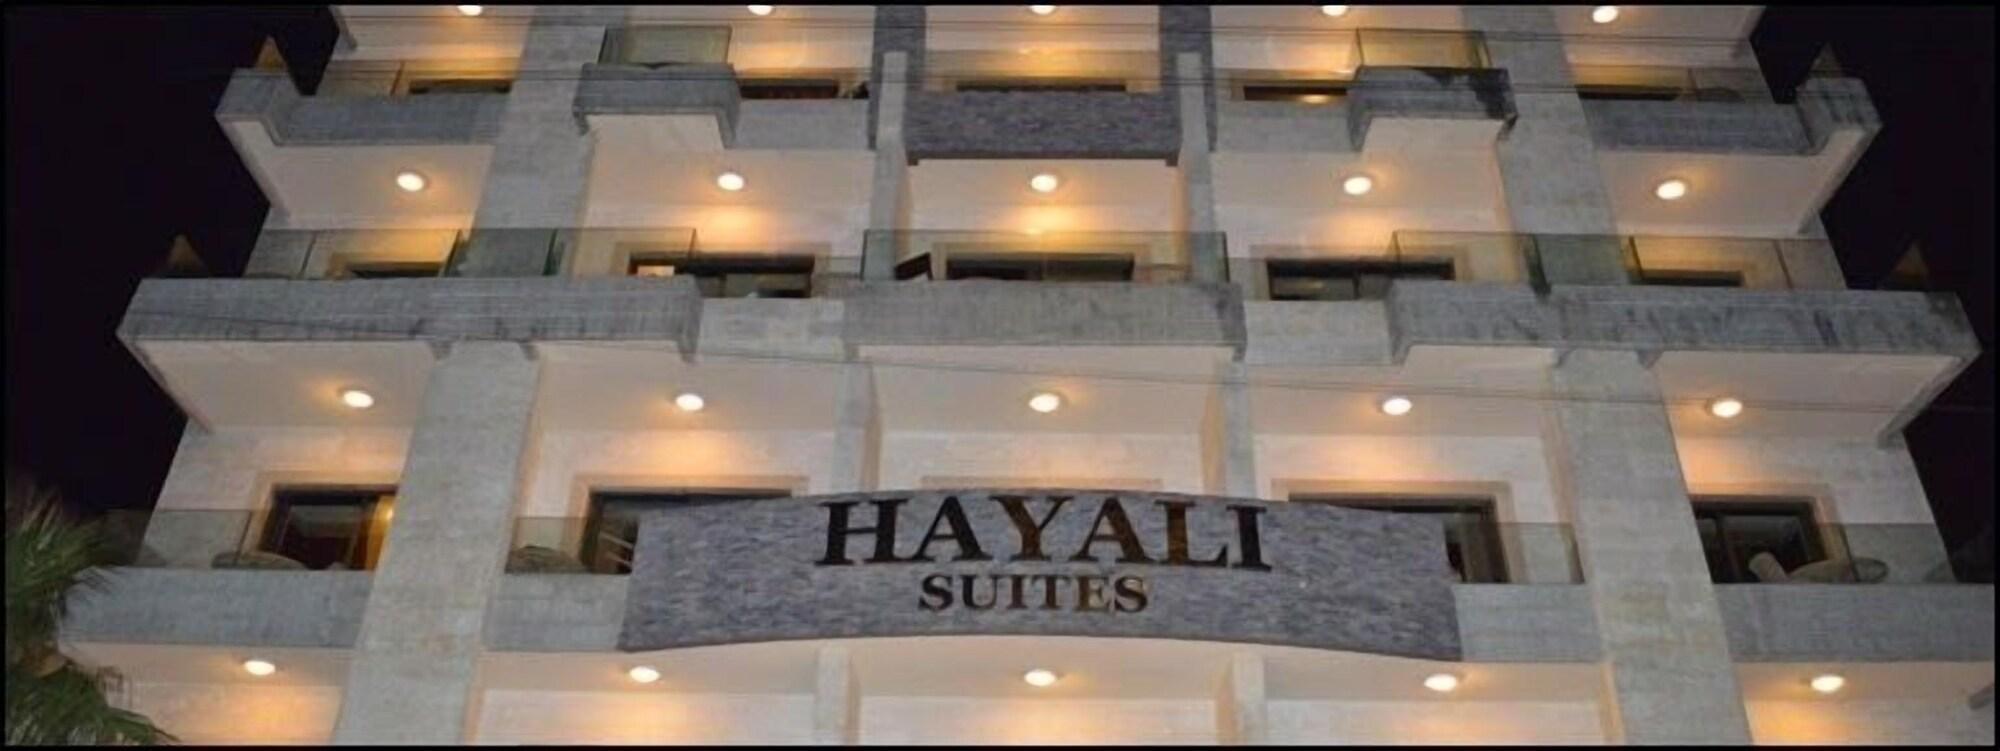 Hayali Suites, Kasrouane